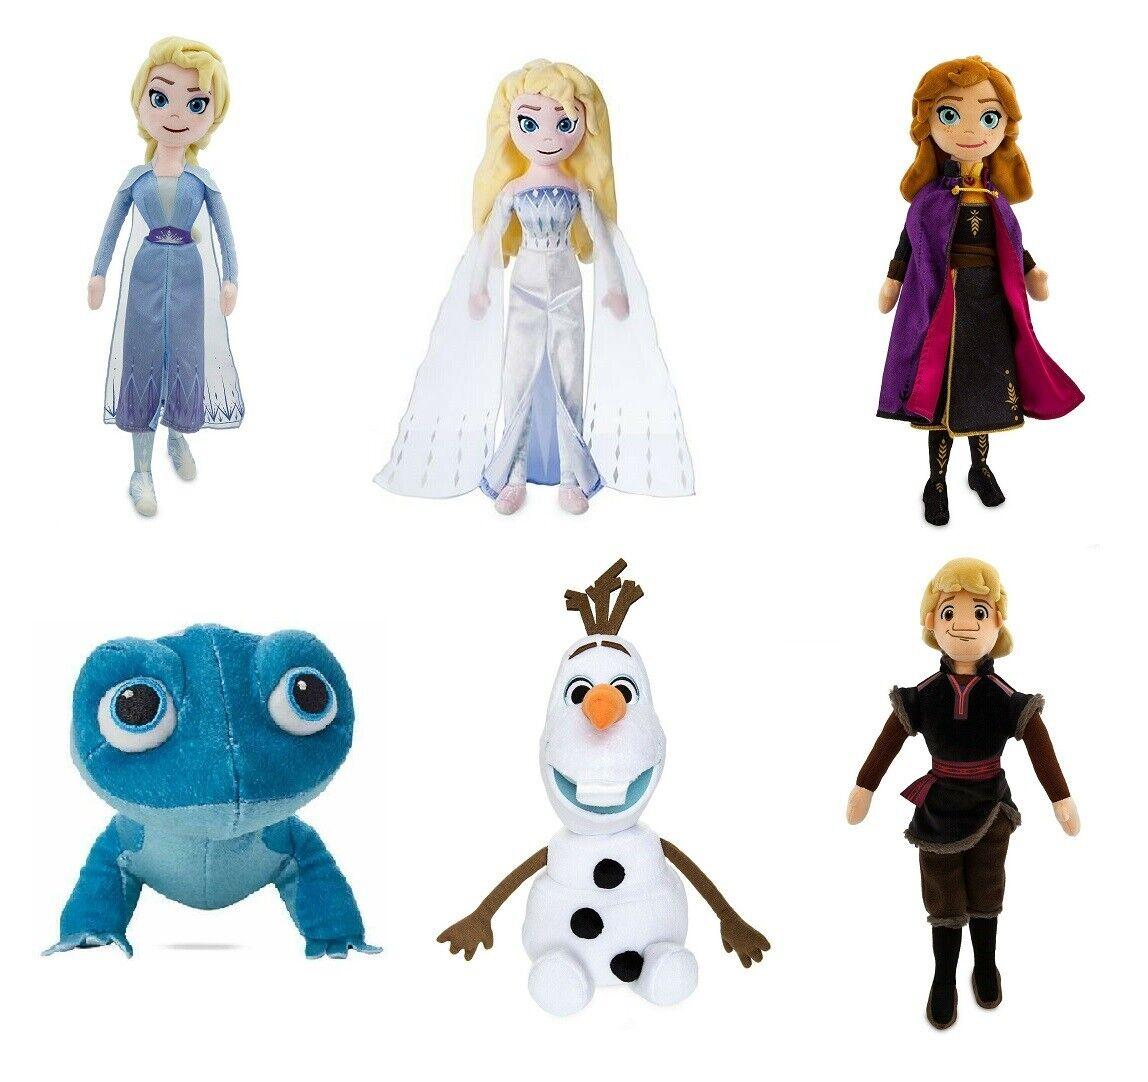 Disney Frozen 2 Plush Doll Collector Set SALAMANDER Elsa Kristoff Olaf Sven Gift